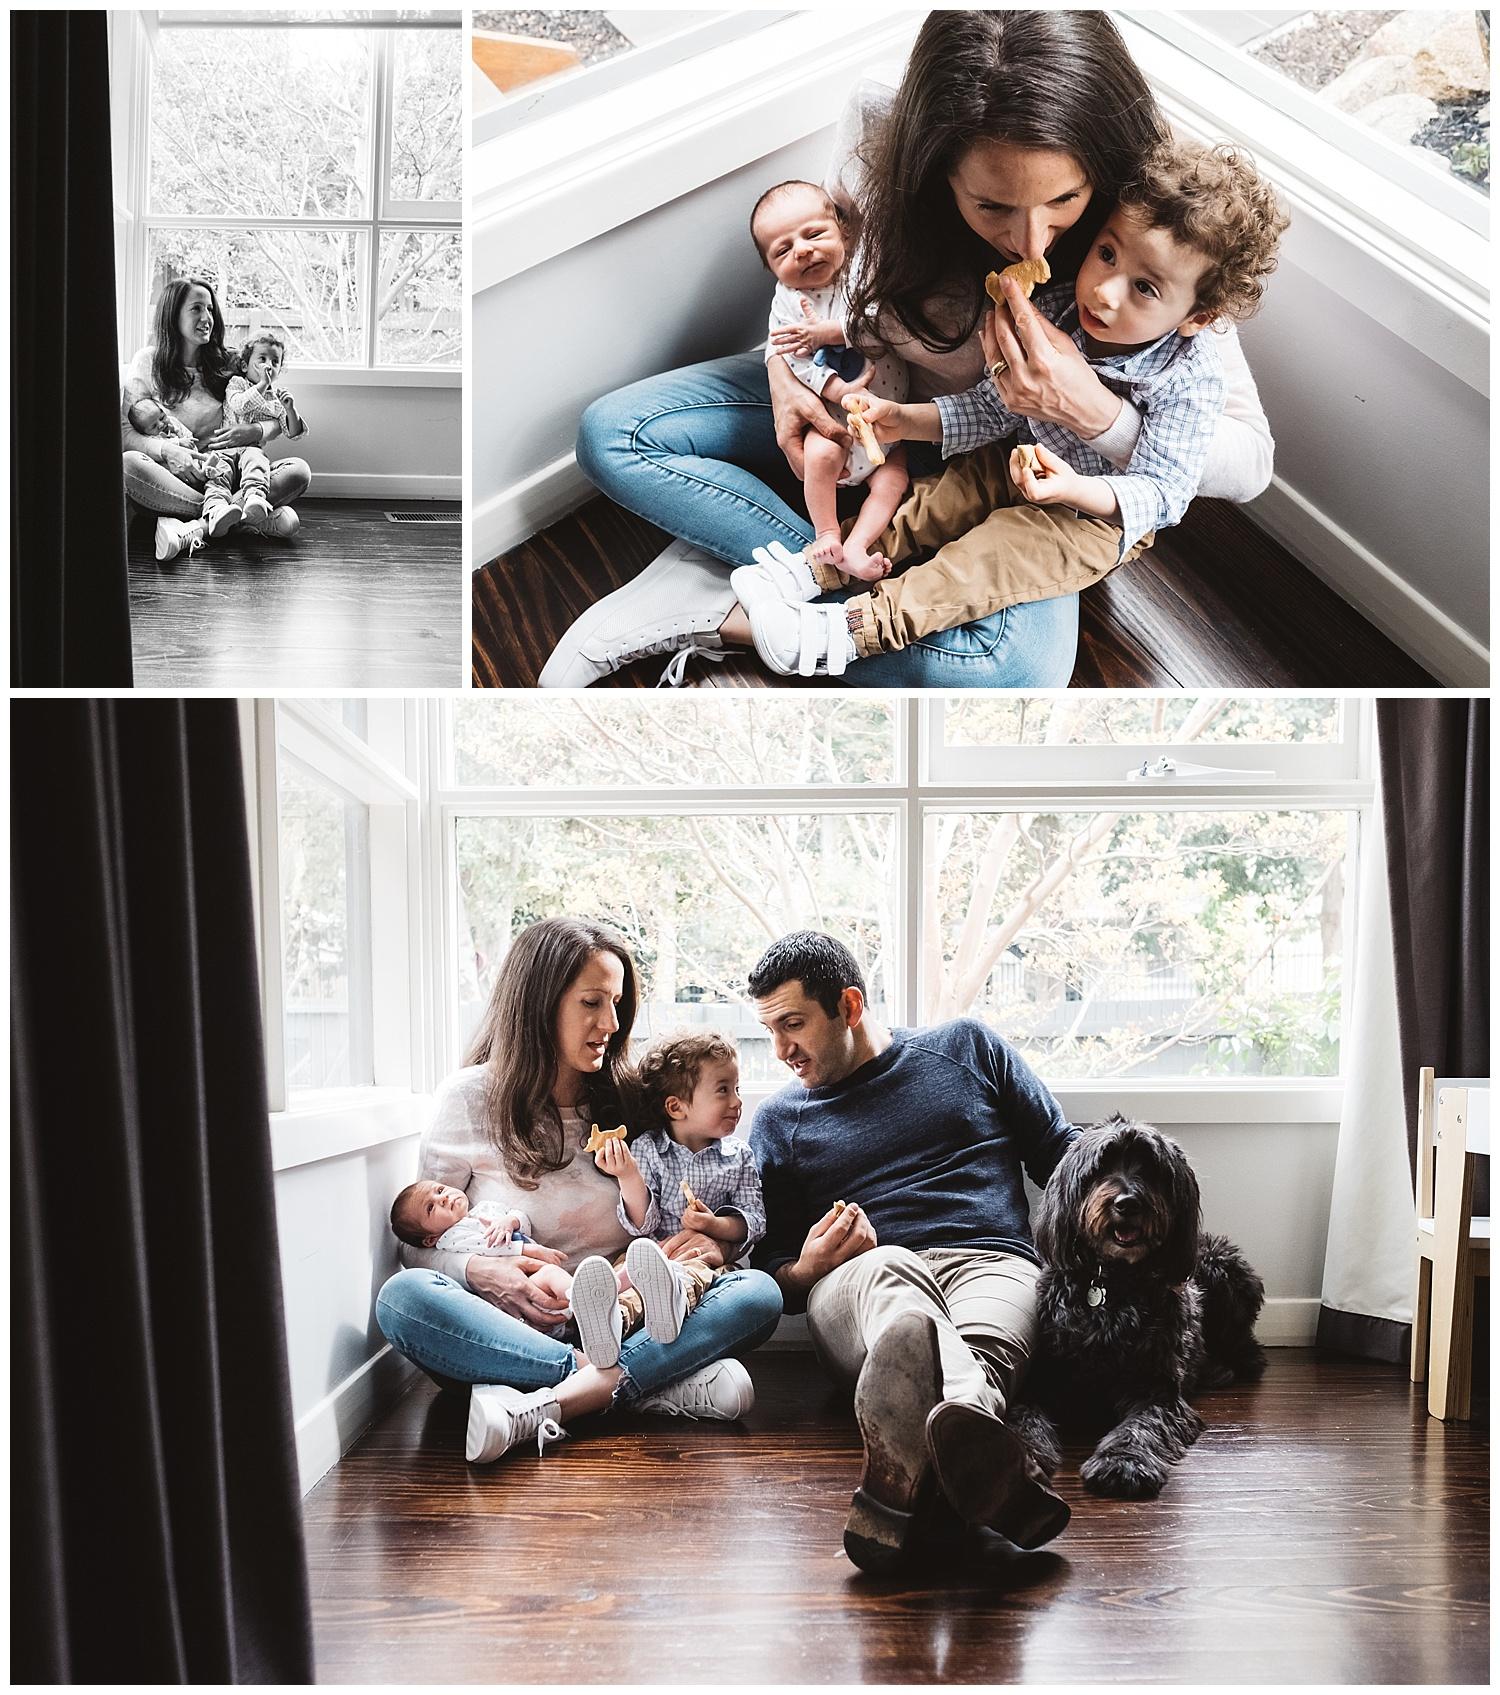 malvern east family portraits and newborn photos